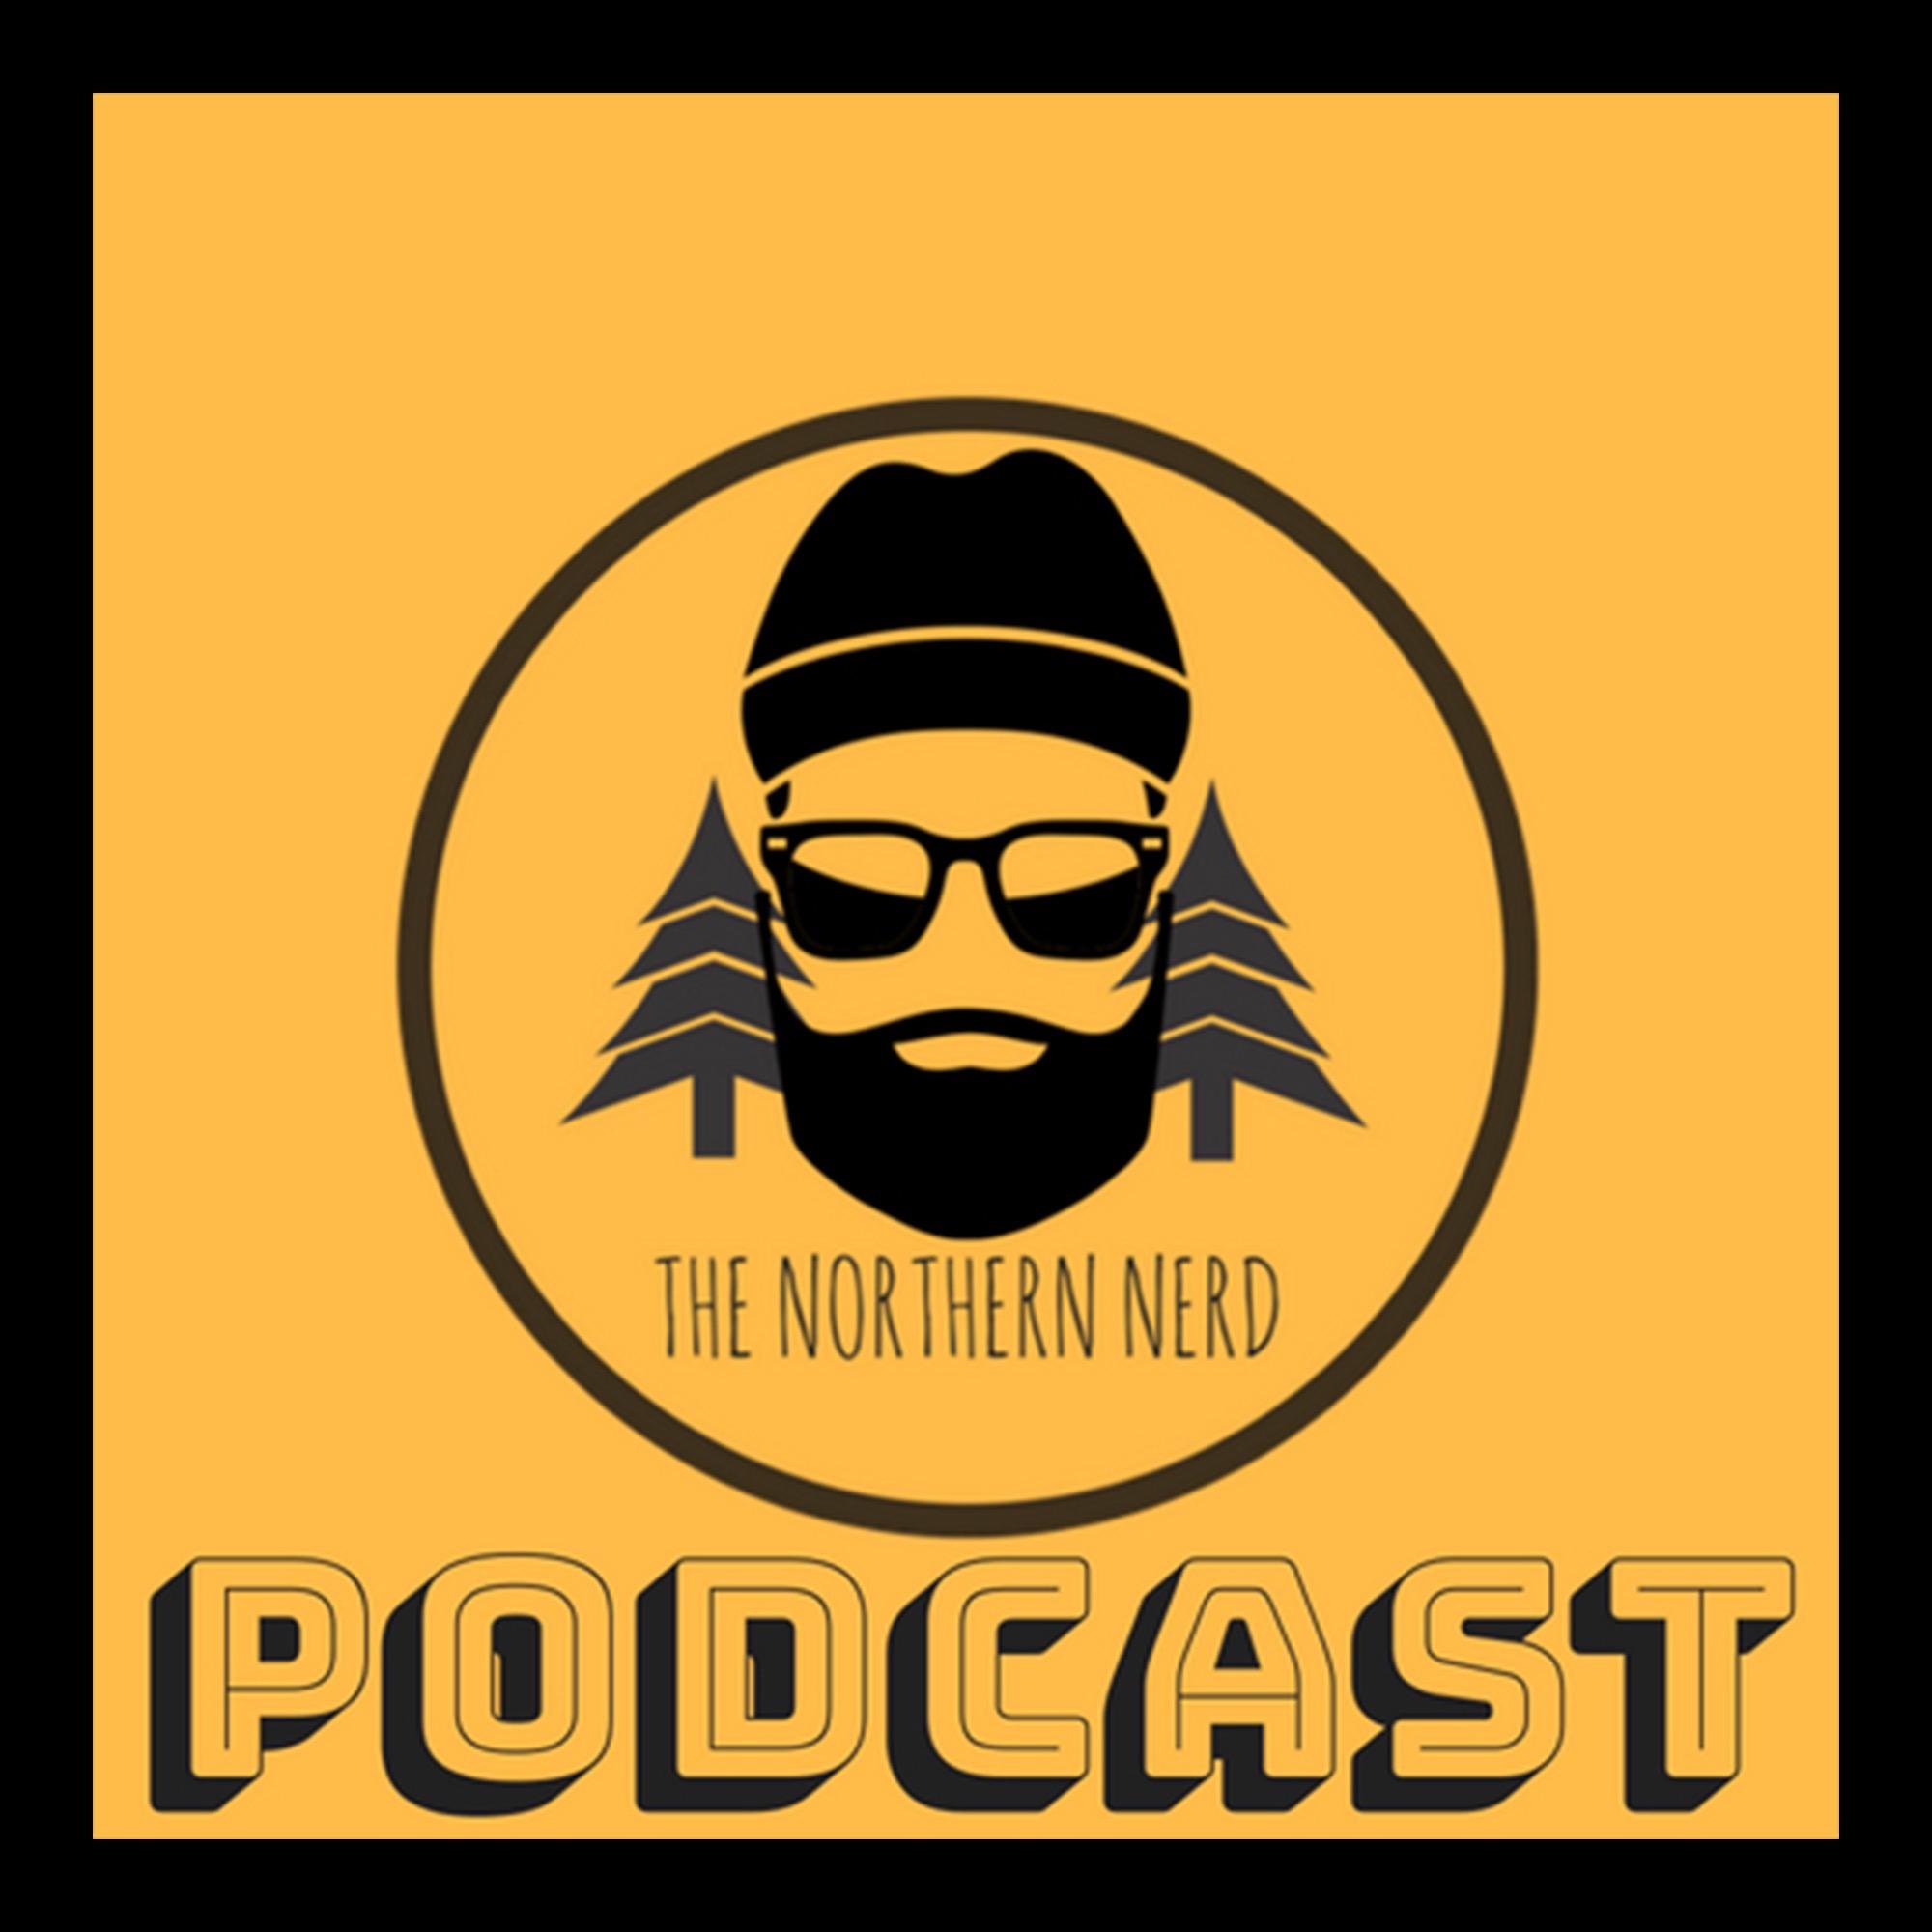 Episode 6: Pete Winslow